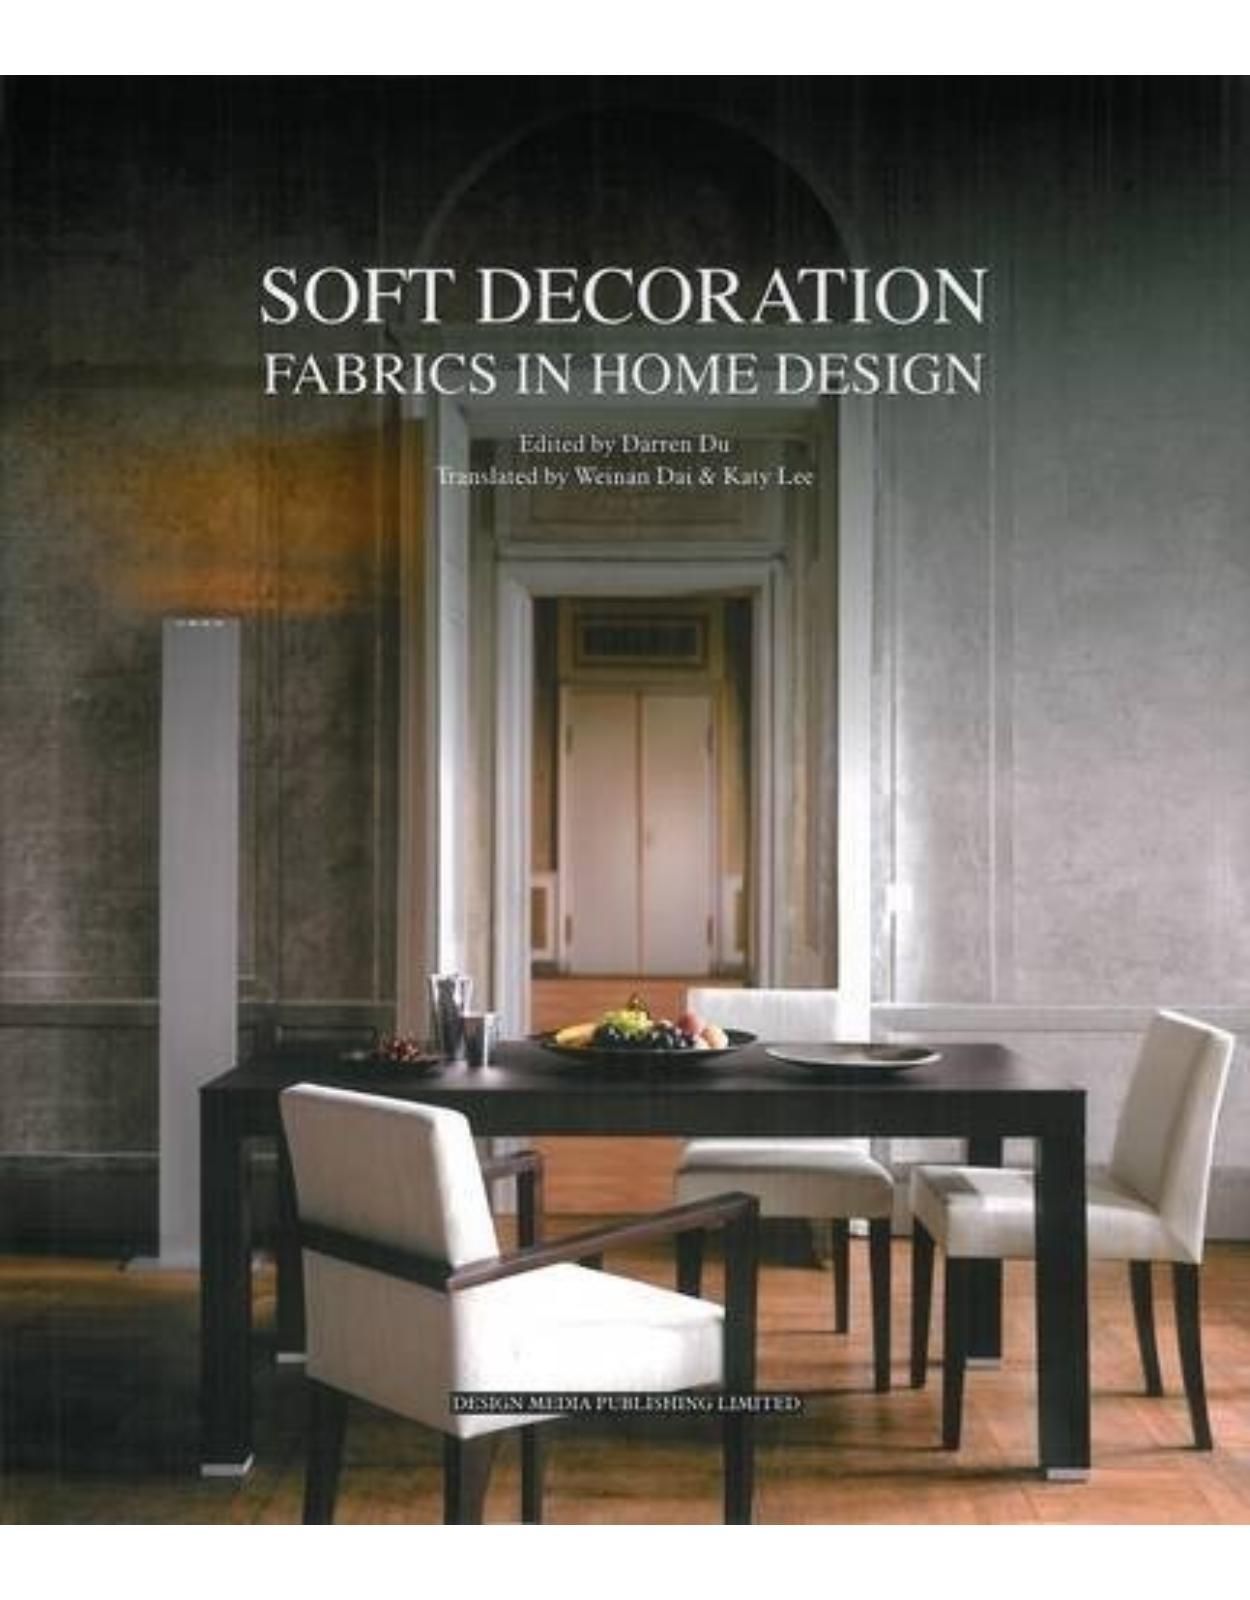 Soft Decoration: Fabrics in Home Design